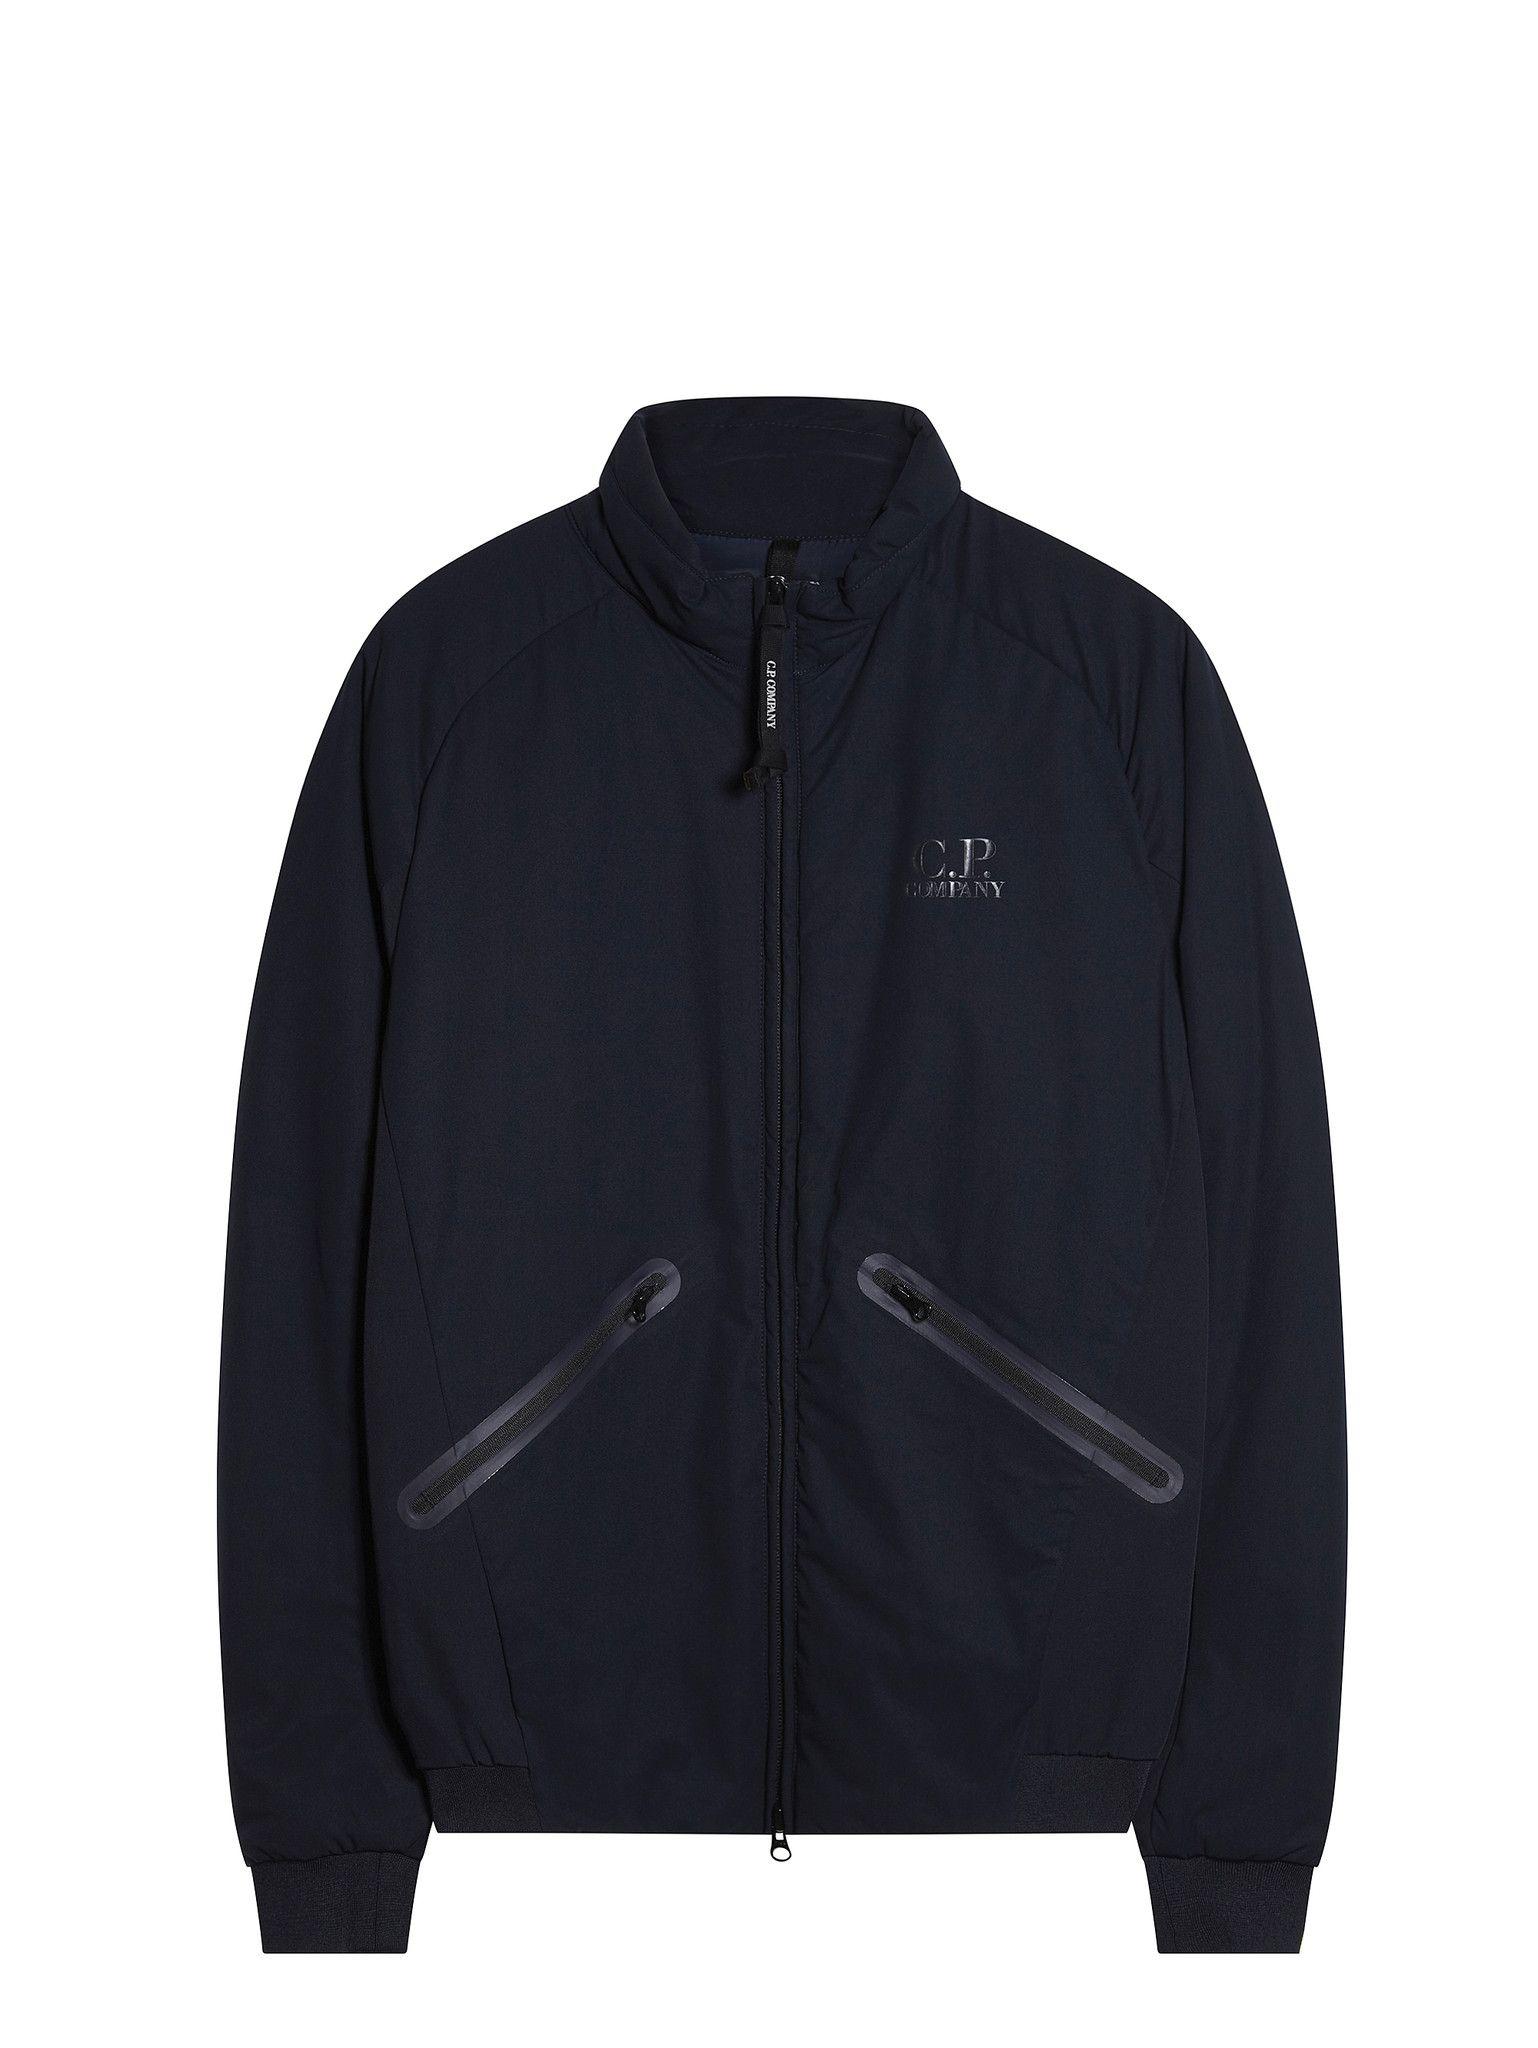 C.P. Company Pro-Tek Jacket in Navy